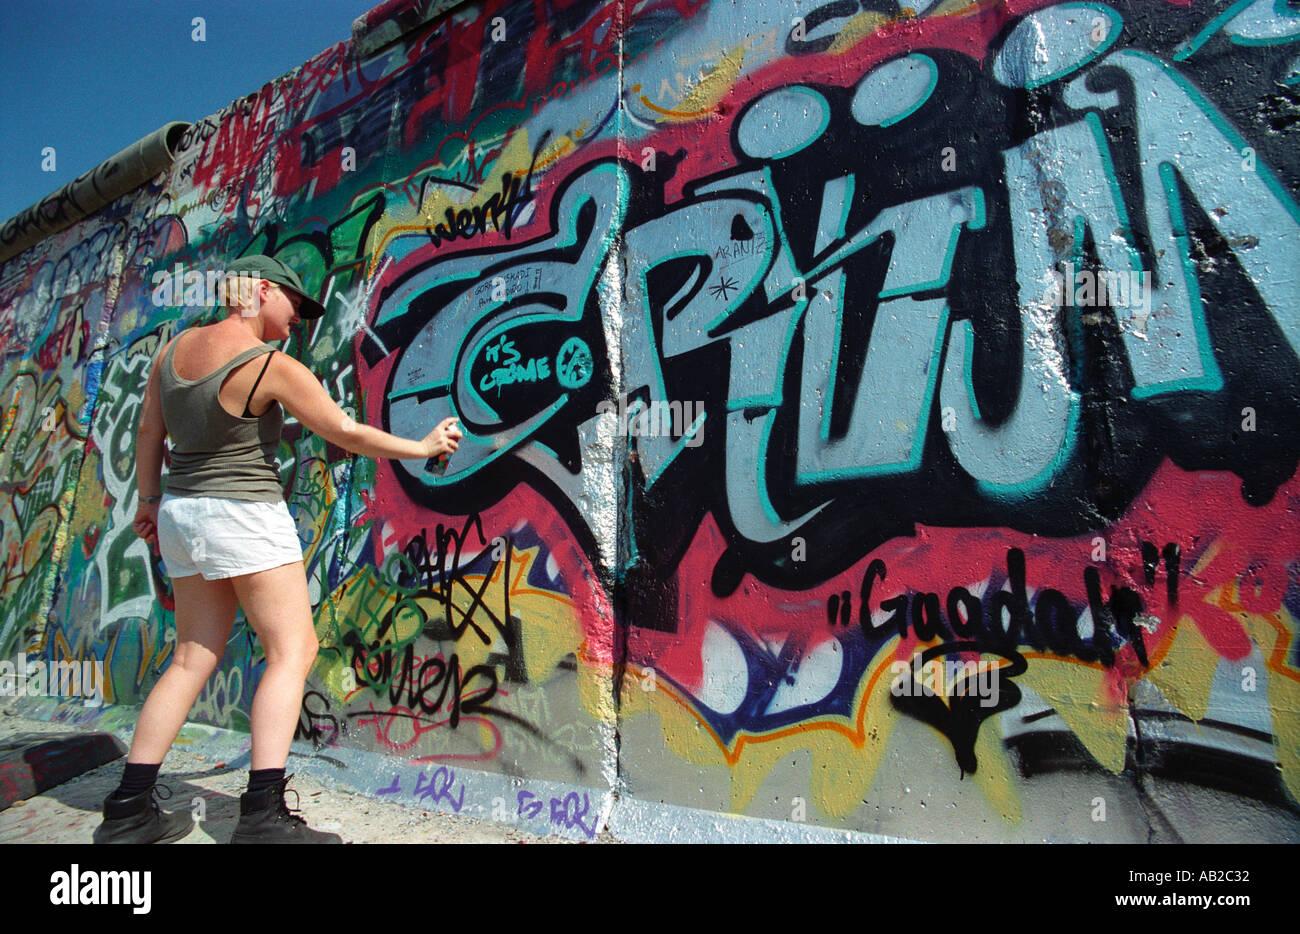 Graffitti Artist - Stock Image